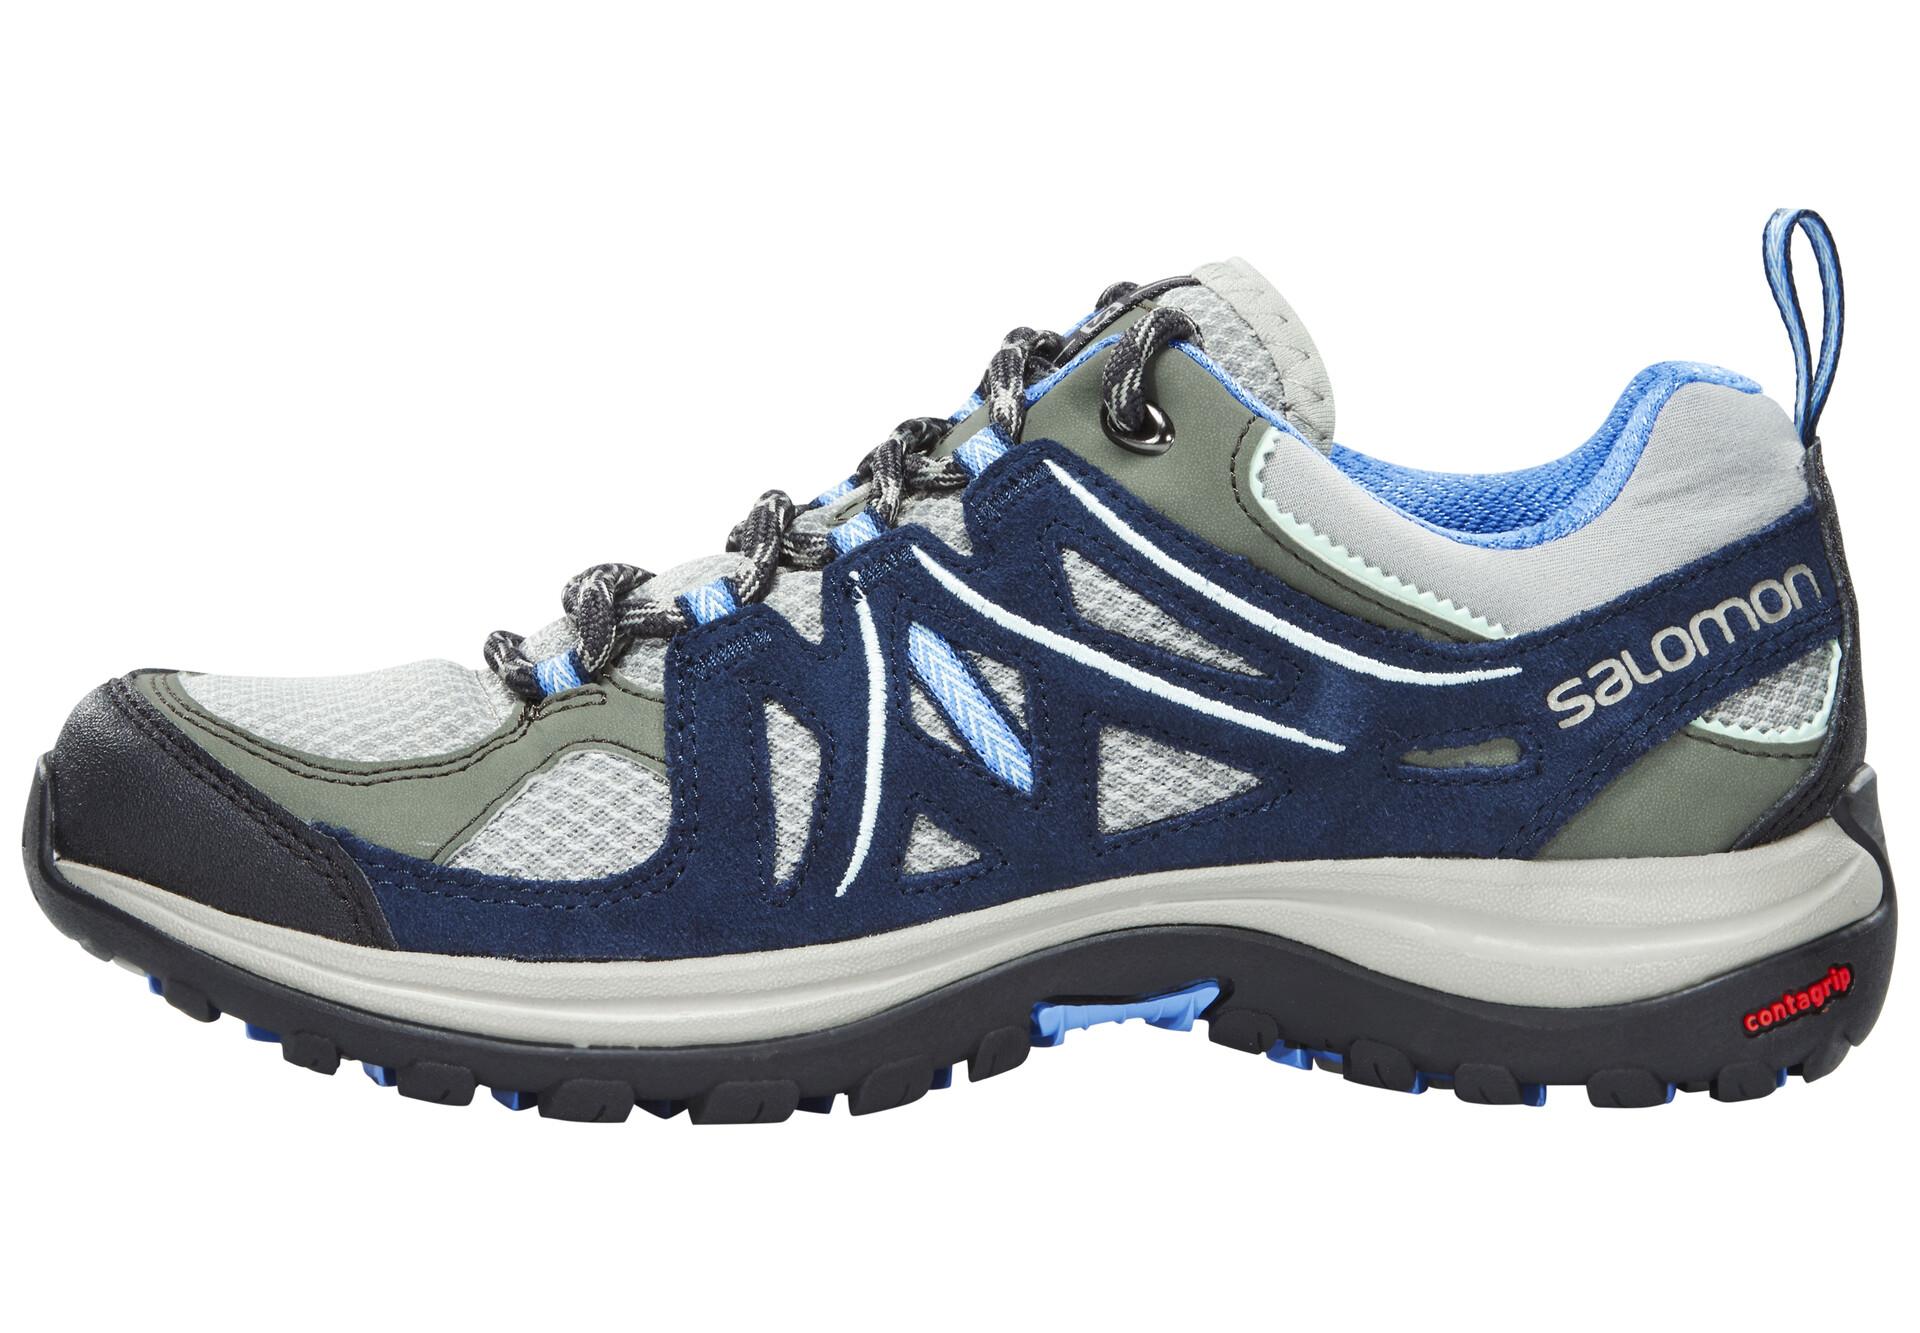 Salomon Ellipse 2 Aero Chaussures de randonnée Femme, titaniumdeep bluepetunia blue